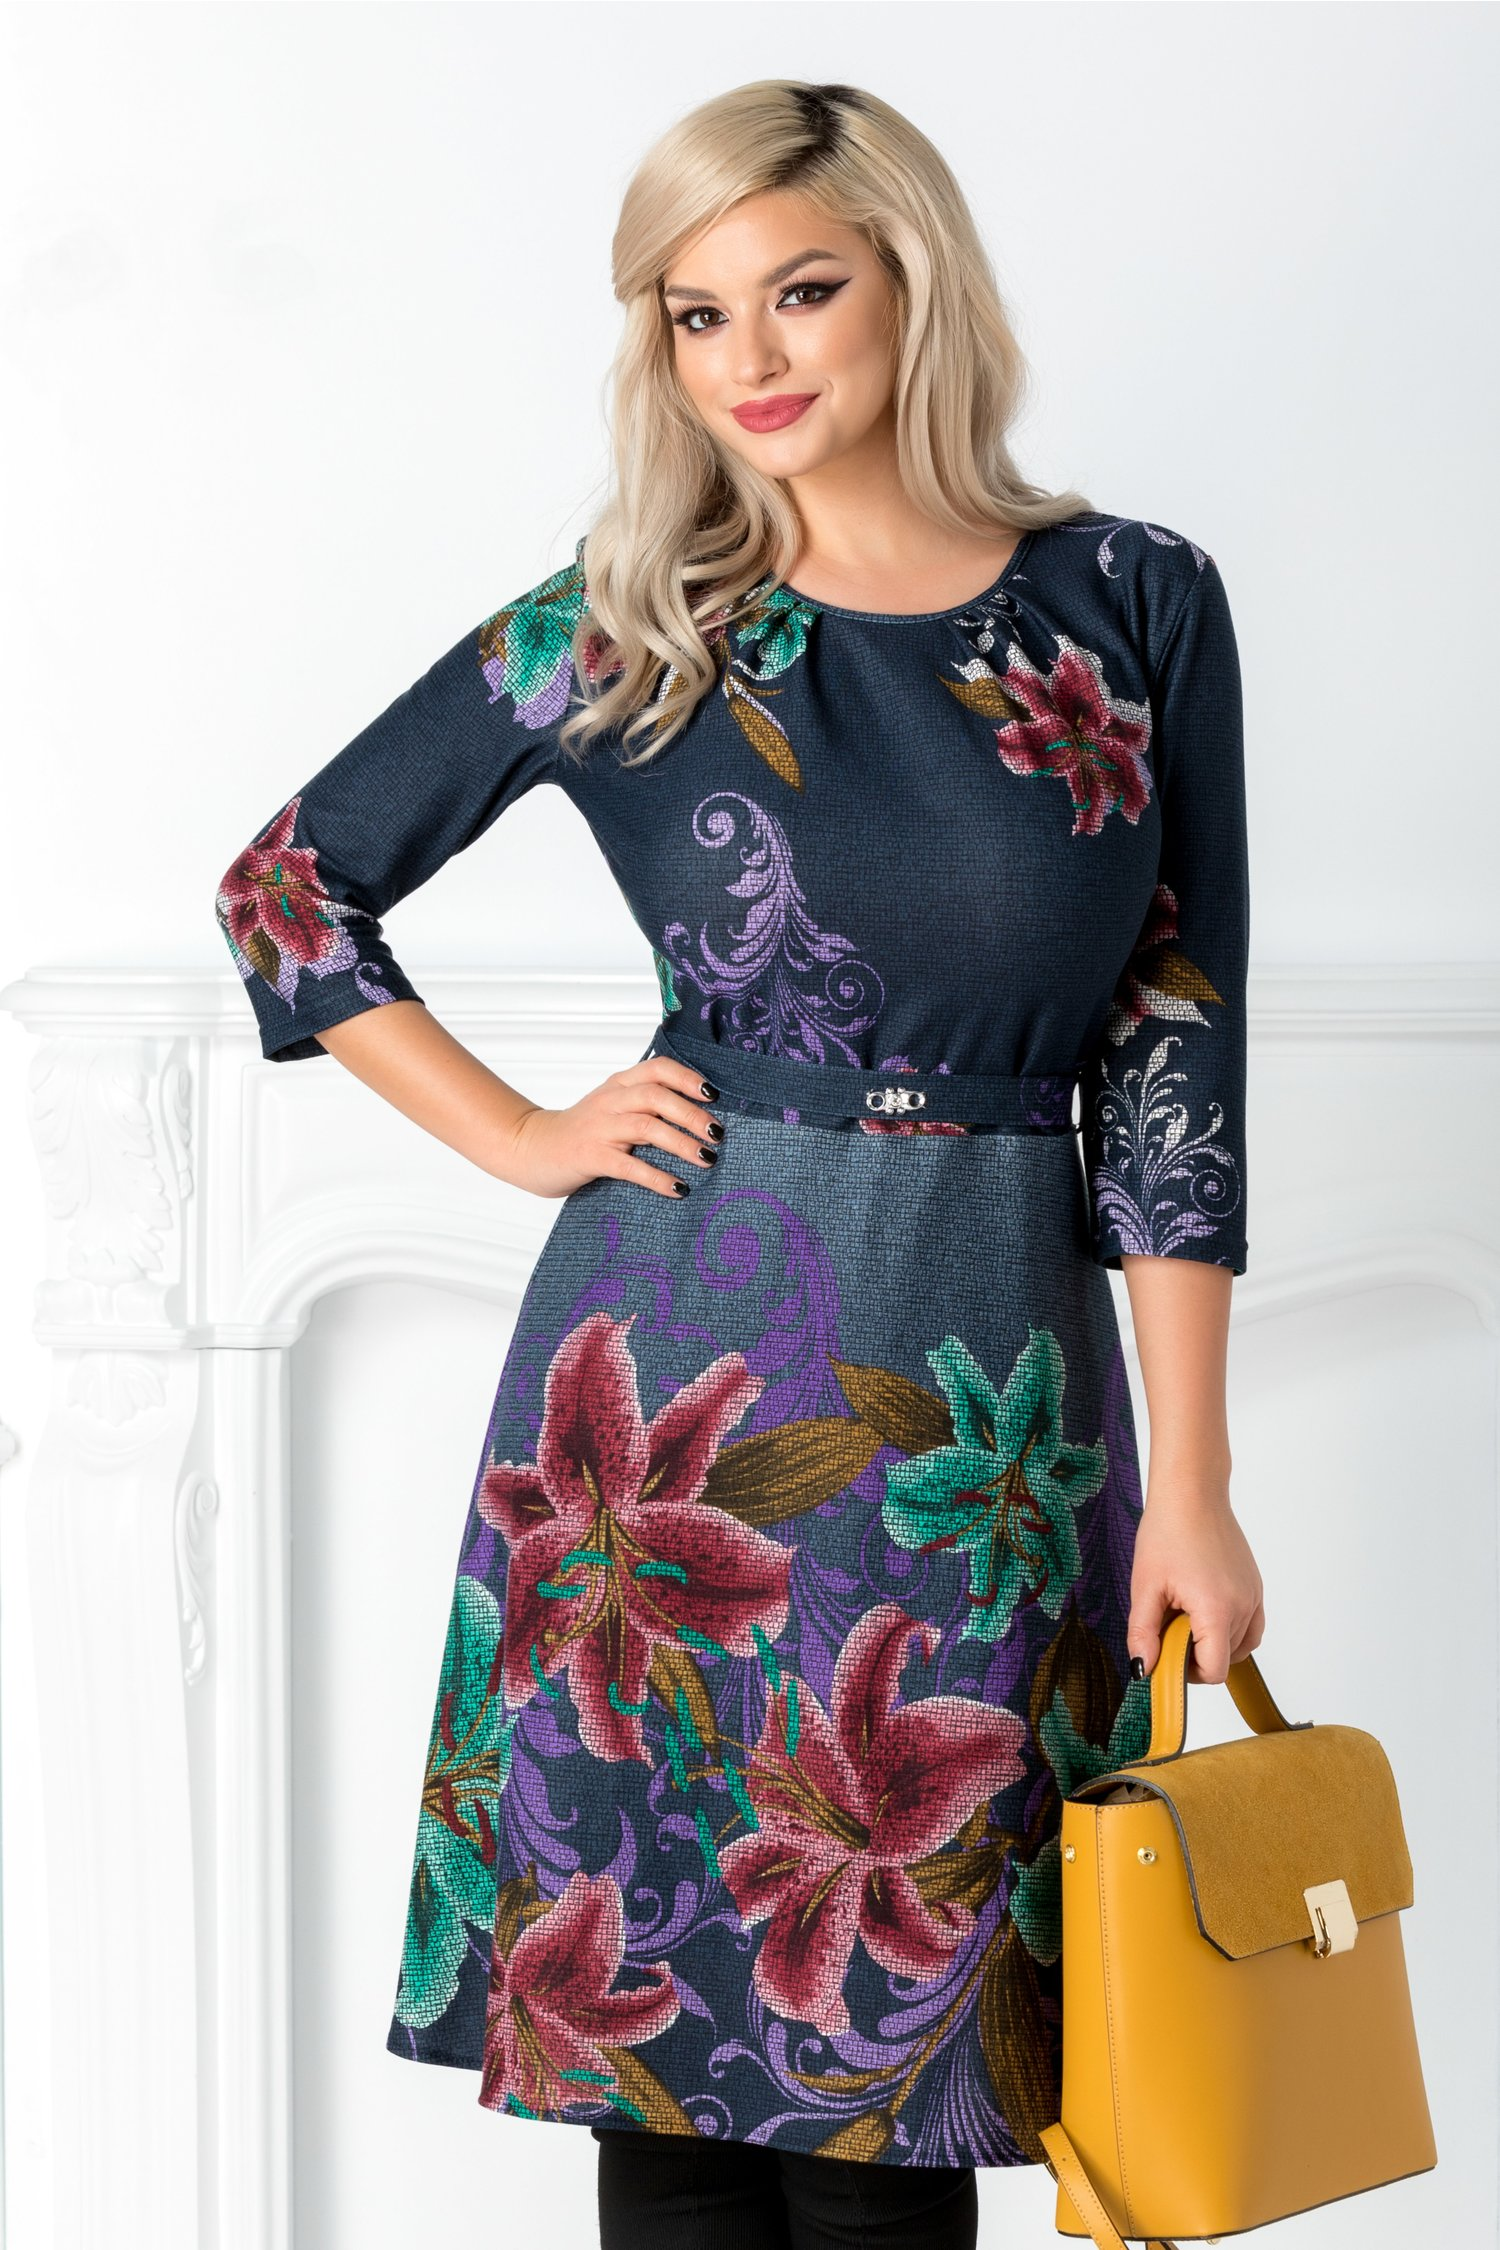 Rochie Anastasia bleumarin cu crini mov si verzi